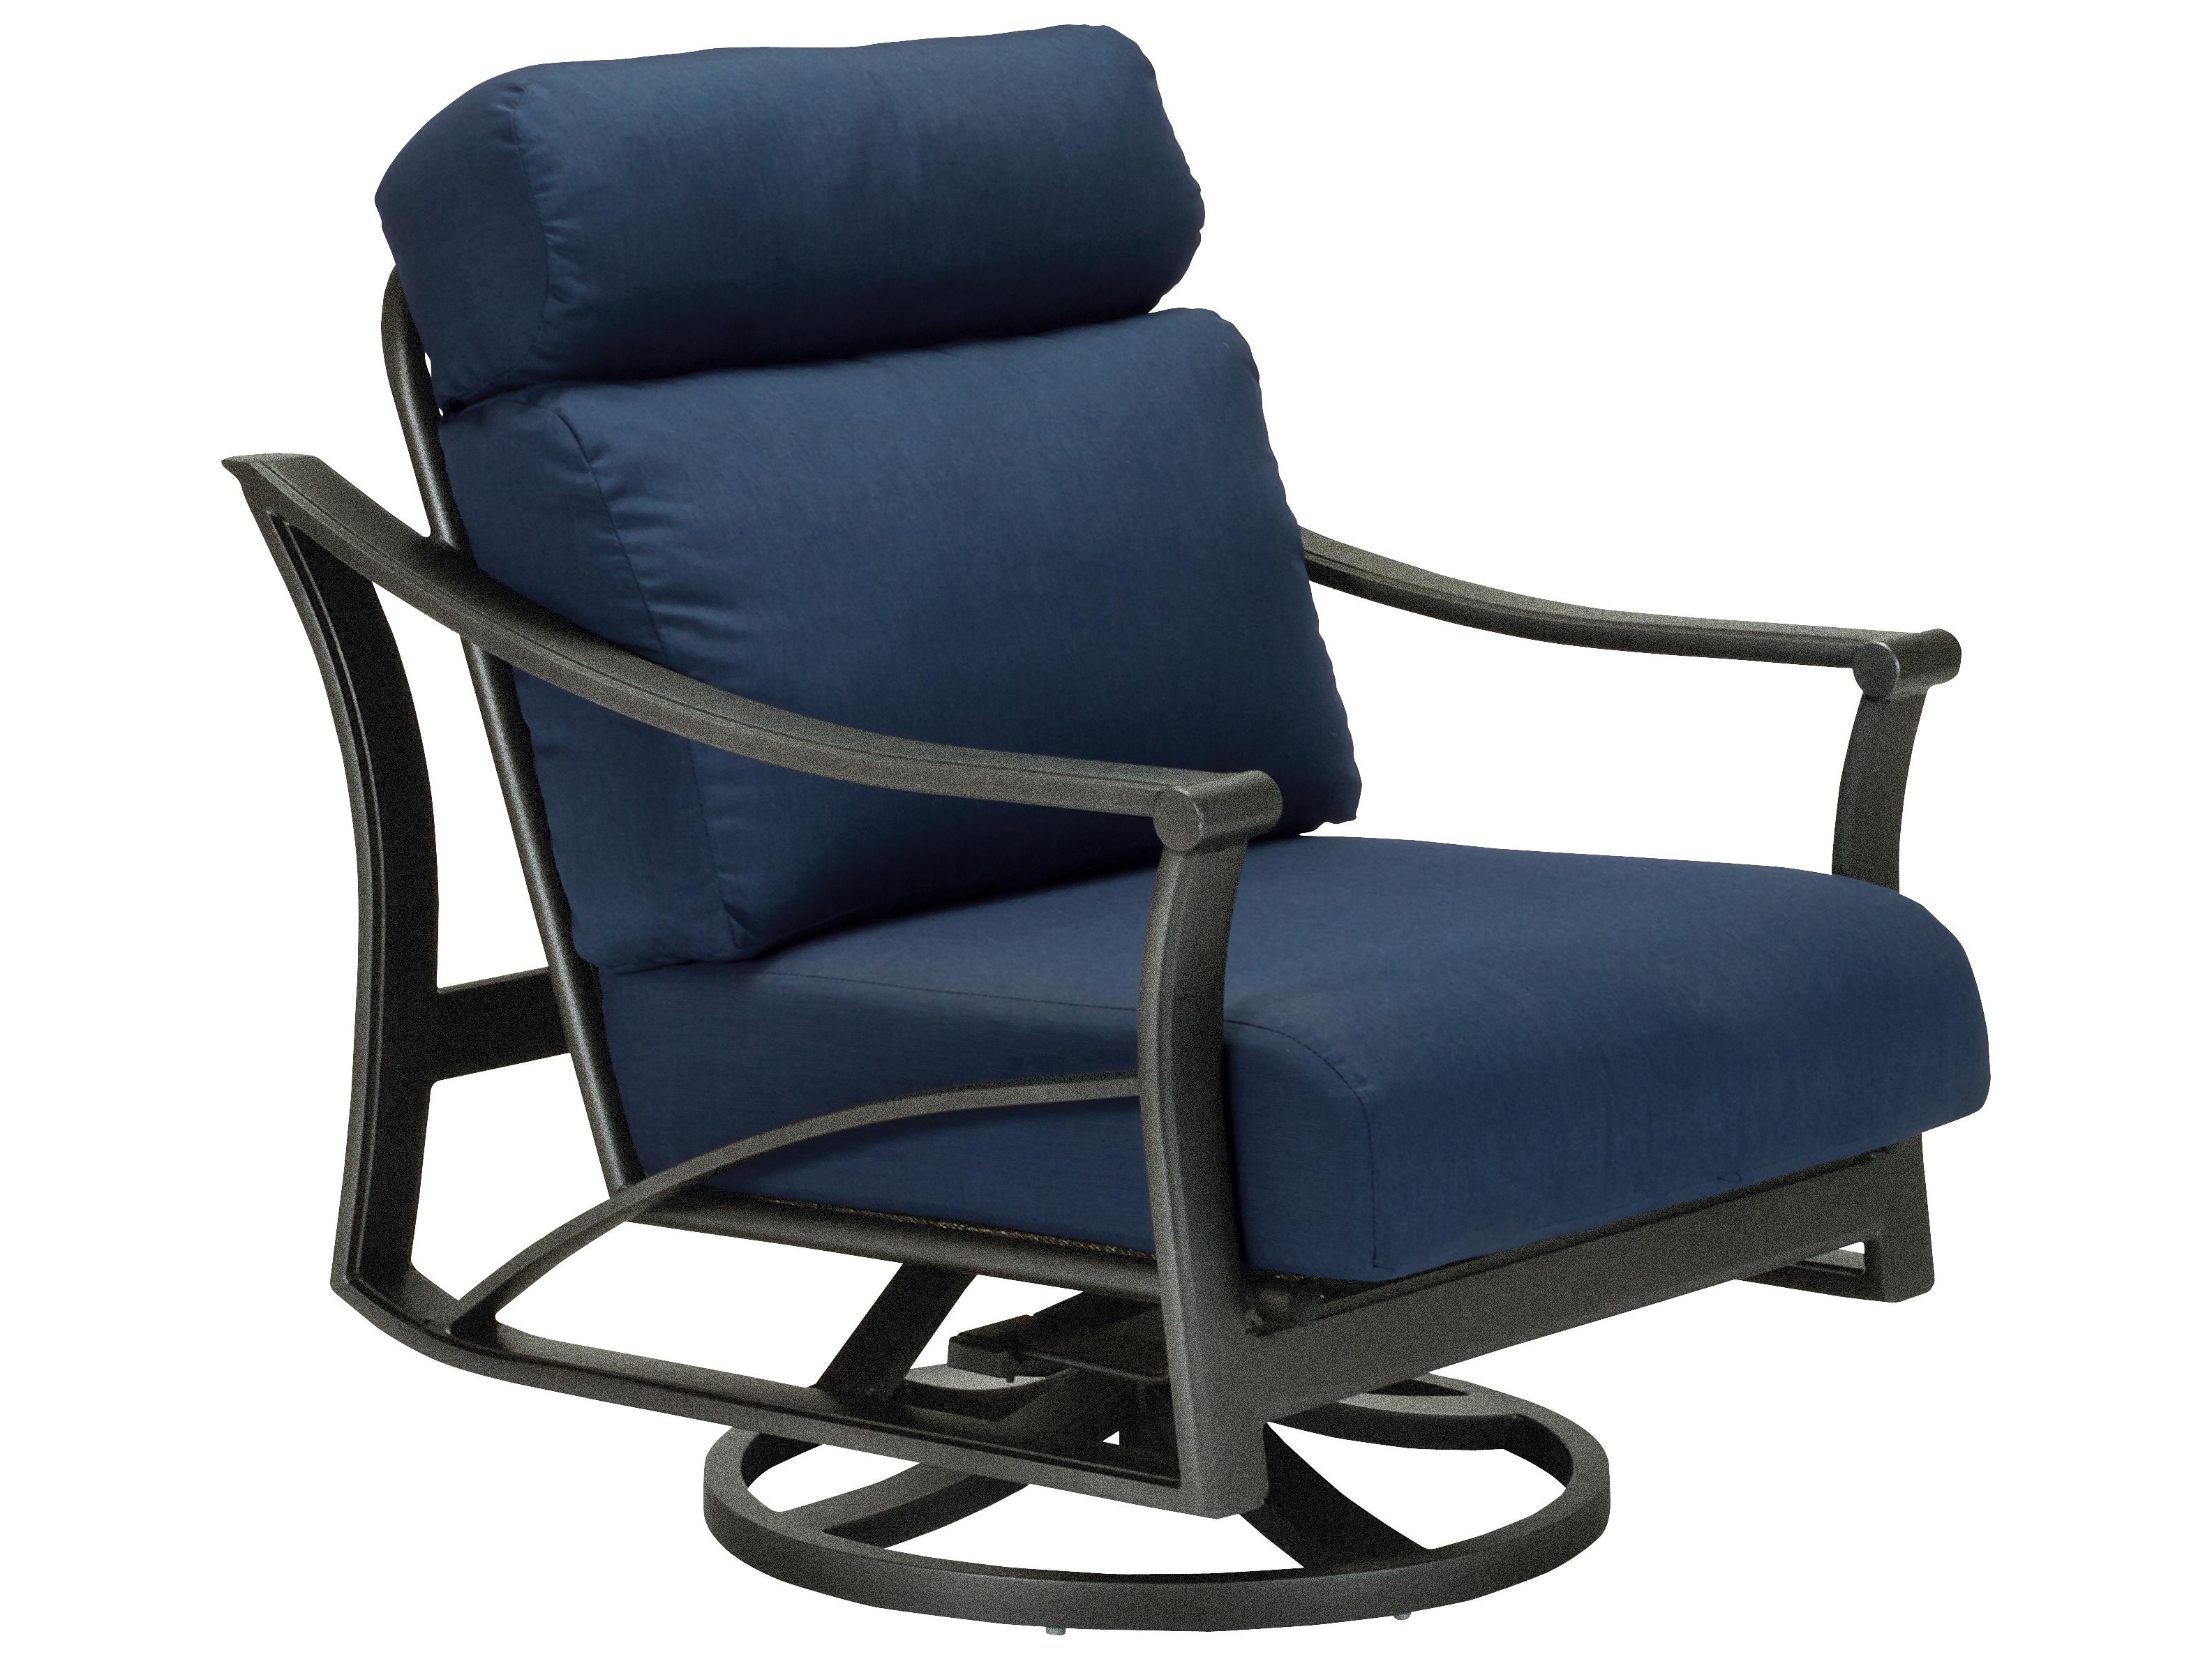 tropitone corsica replacement cushions 171325ntch. Black Bedroom Furniture Sets. Home Design Ideas